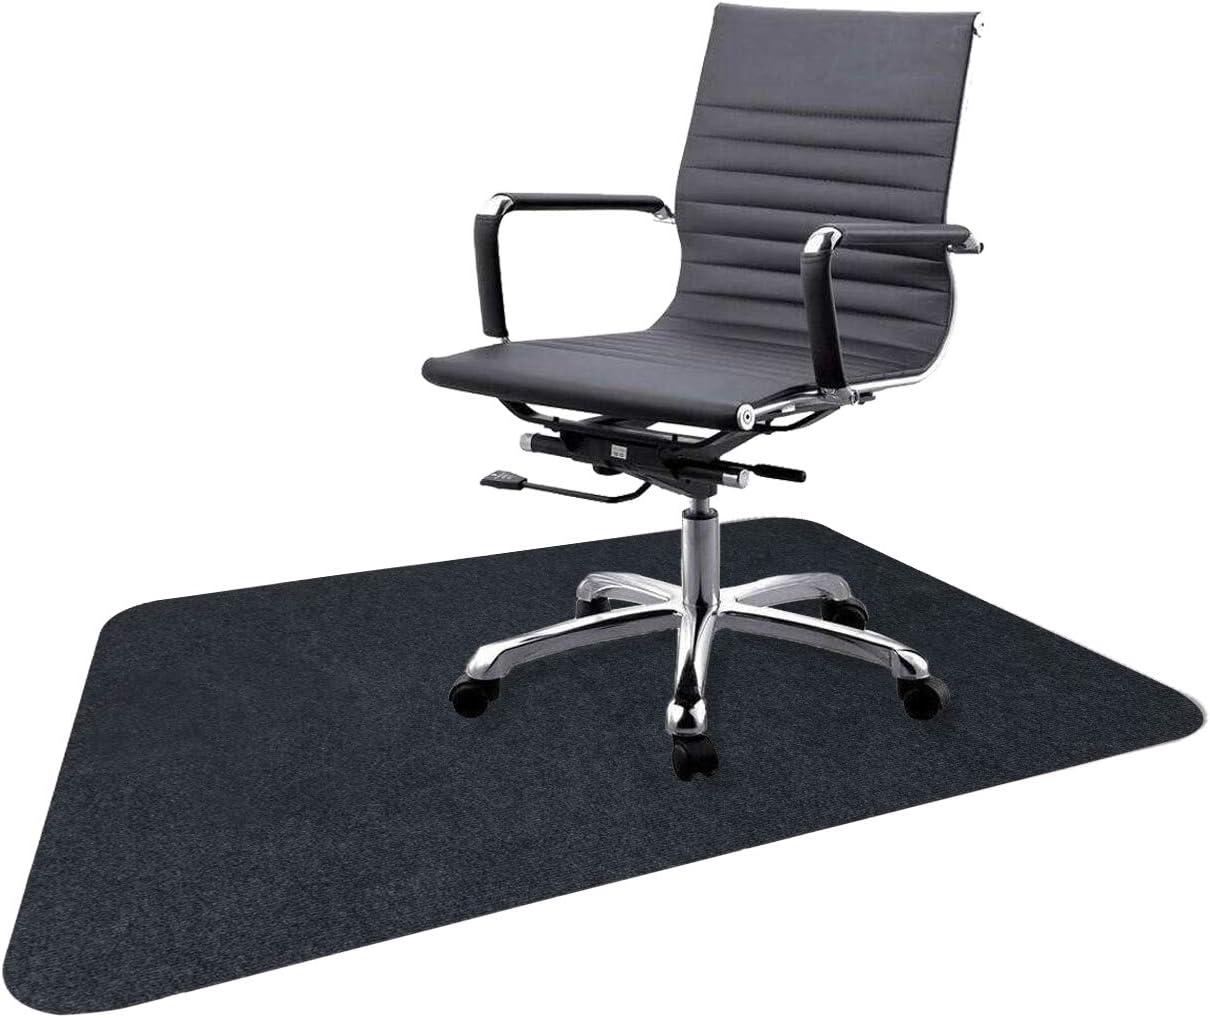 Office Chair Mat for Hardwood Rolling Fixed price sale C Floor Atlanta Mall Desk